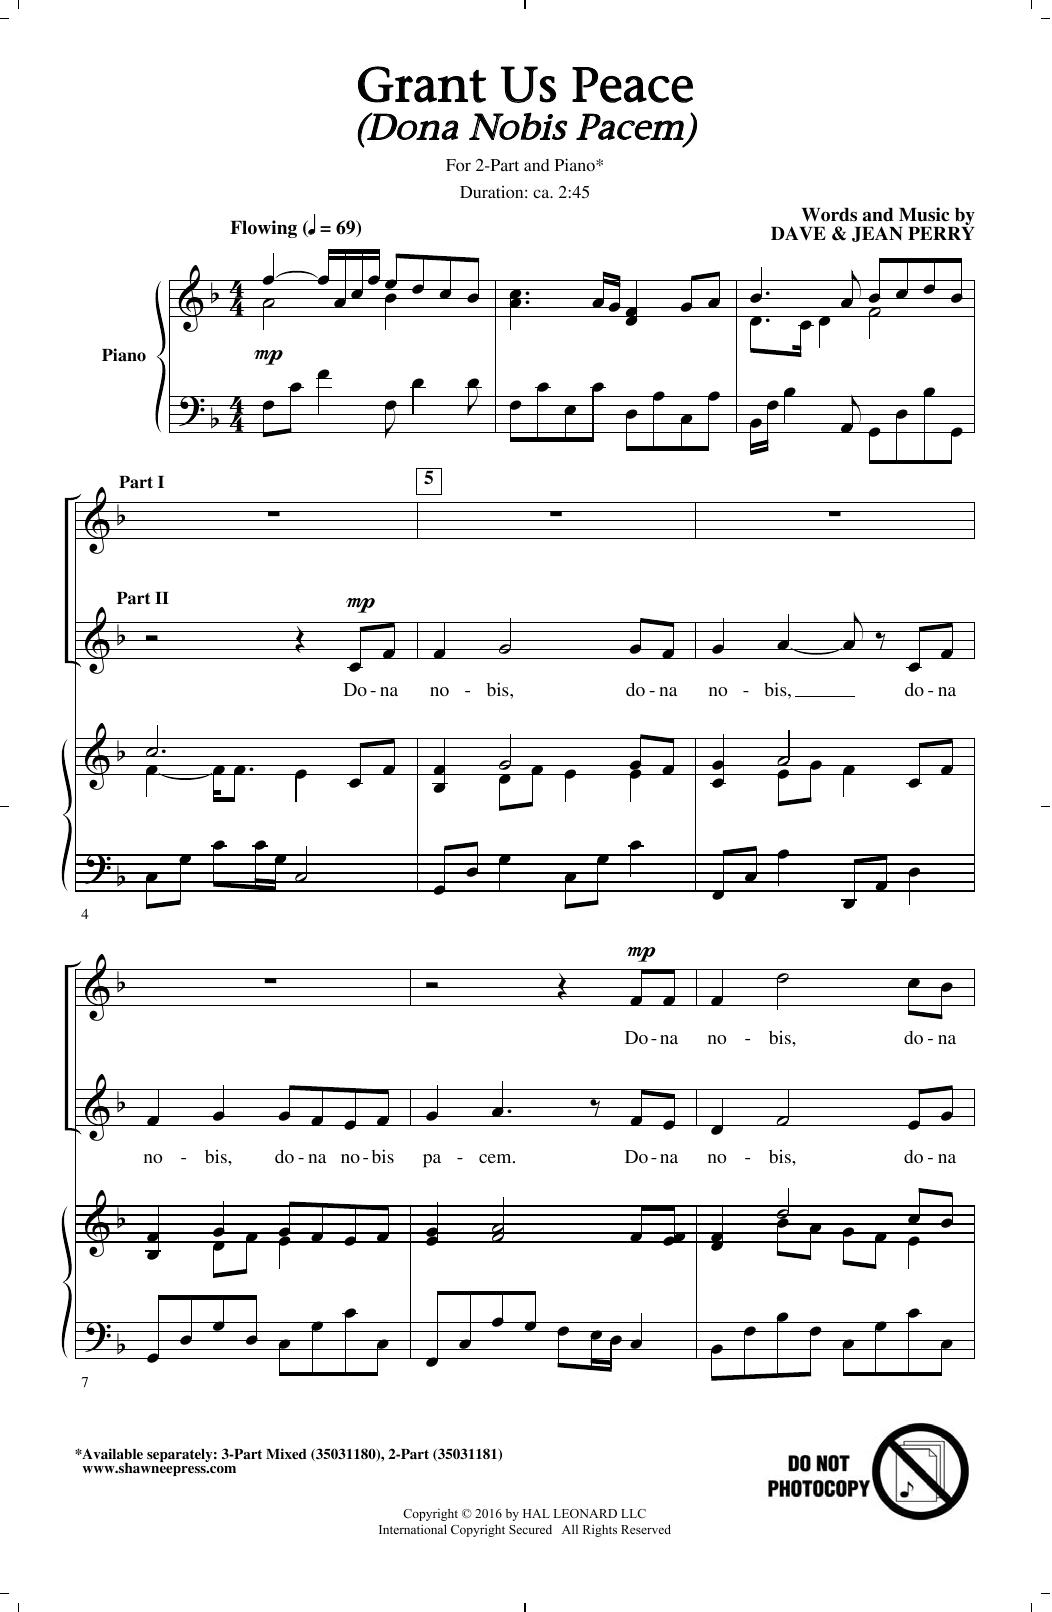 Grant Us Peace (Dona Nobis Pacem) Sheet Music